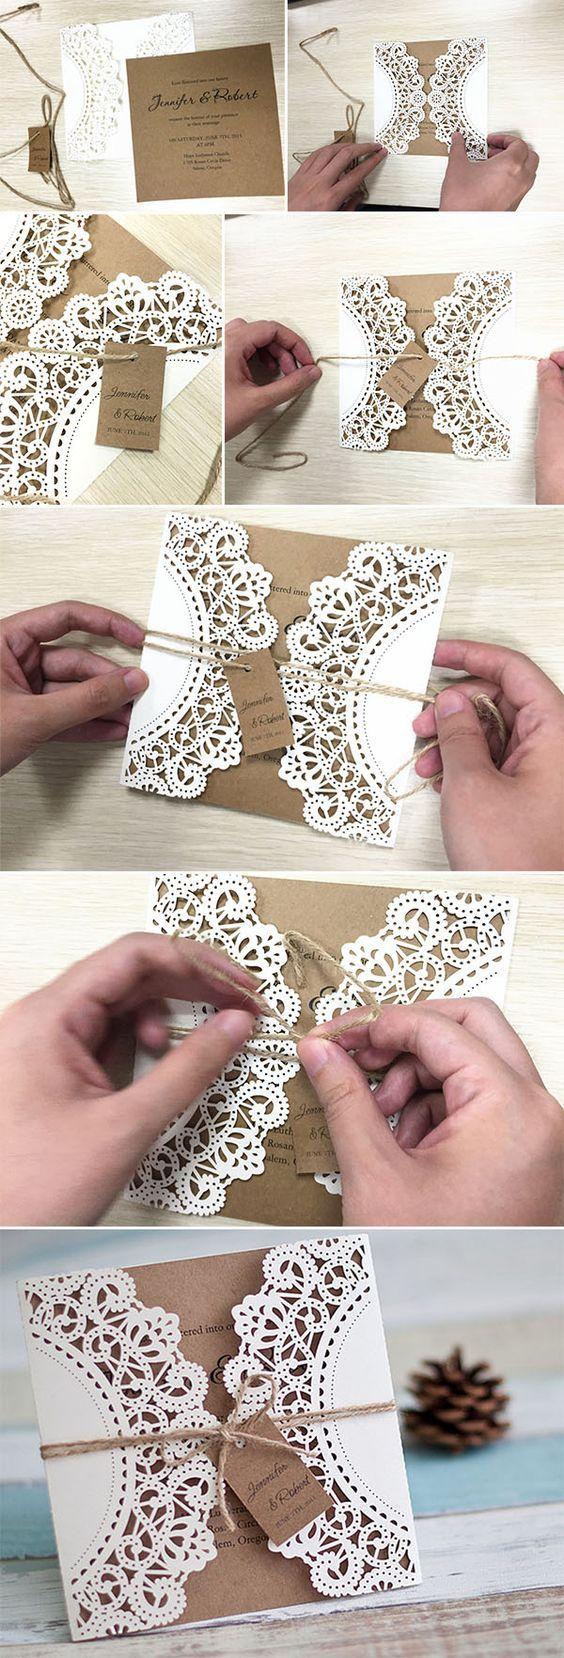 #DIY Lace & Burlap Rustic Wedding Invitations ❤︎ #dreamwedding #inspiration